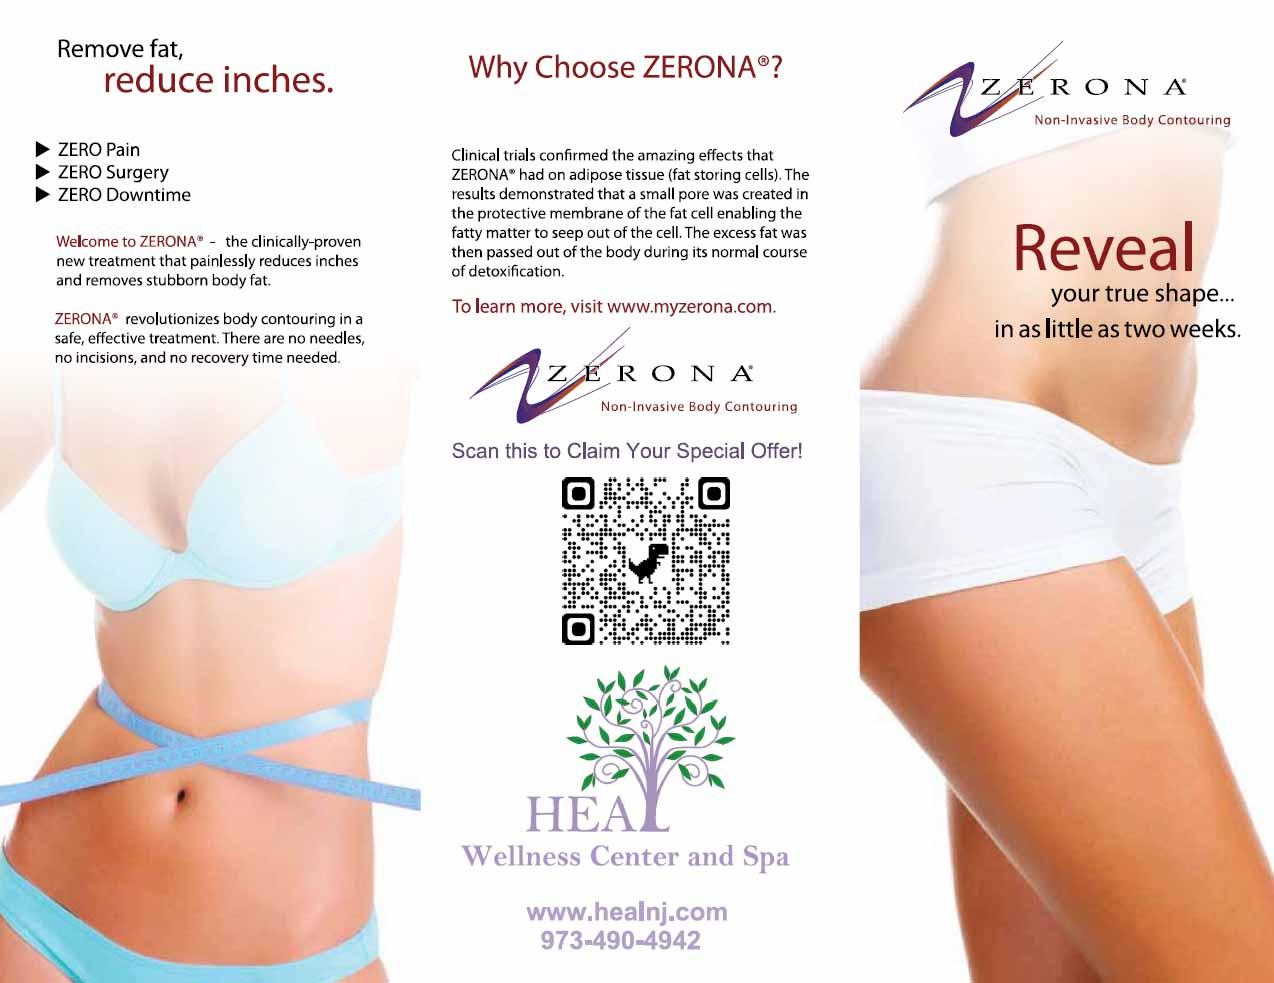 Zerona - Z6 Laser, Body Contourong, Laser Slimming Program